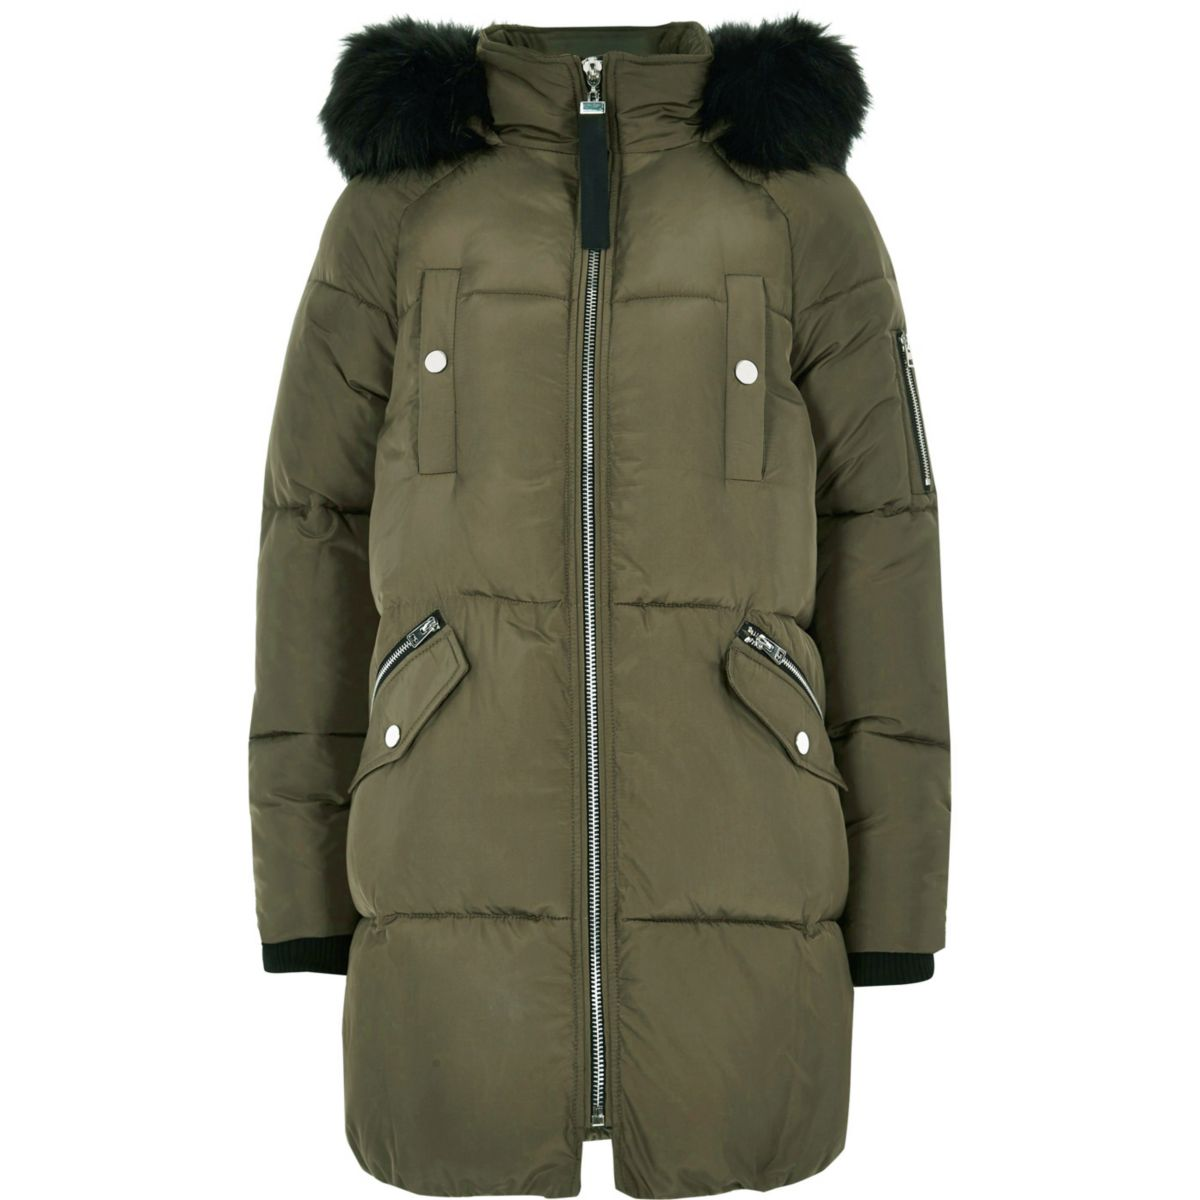 Khaki jacket faux fur trim longline puffer ASArgq